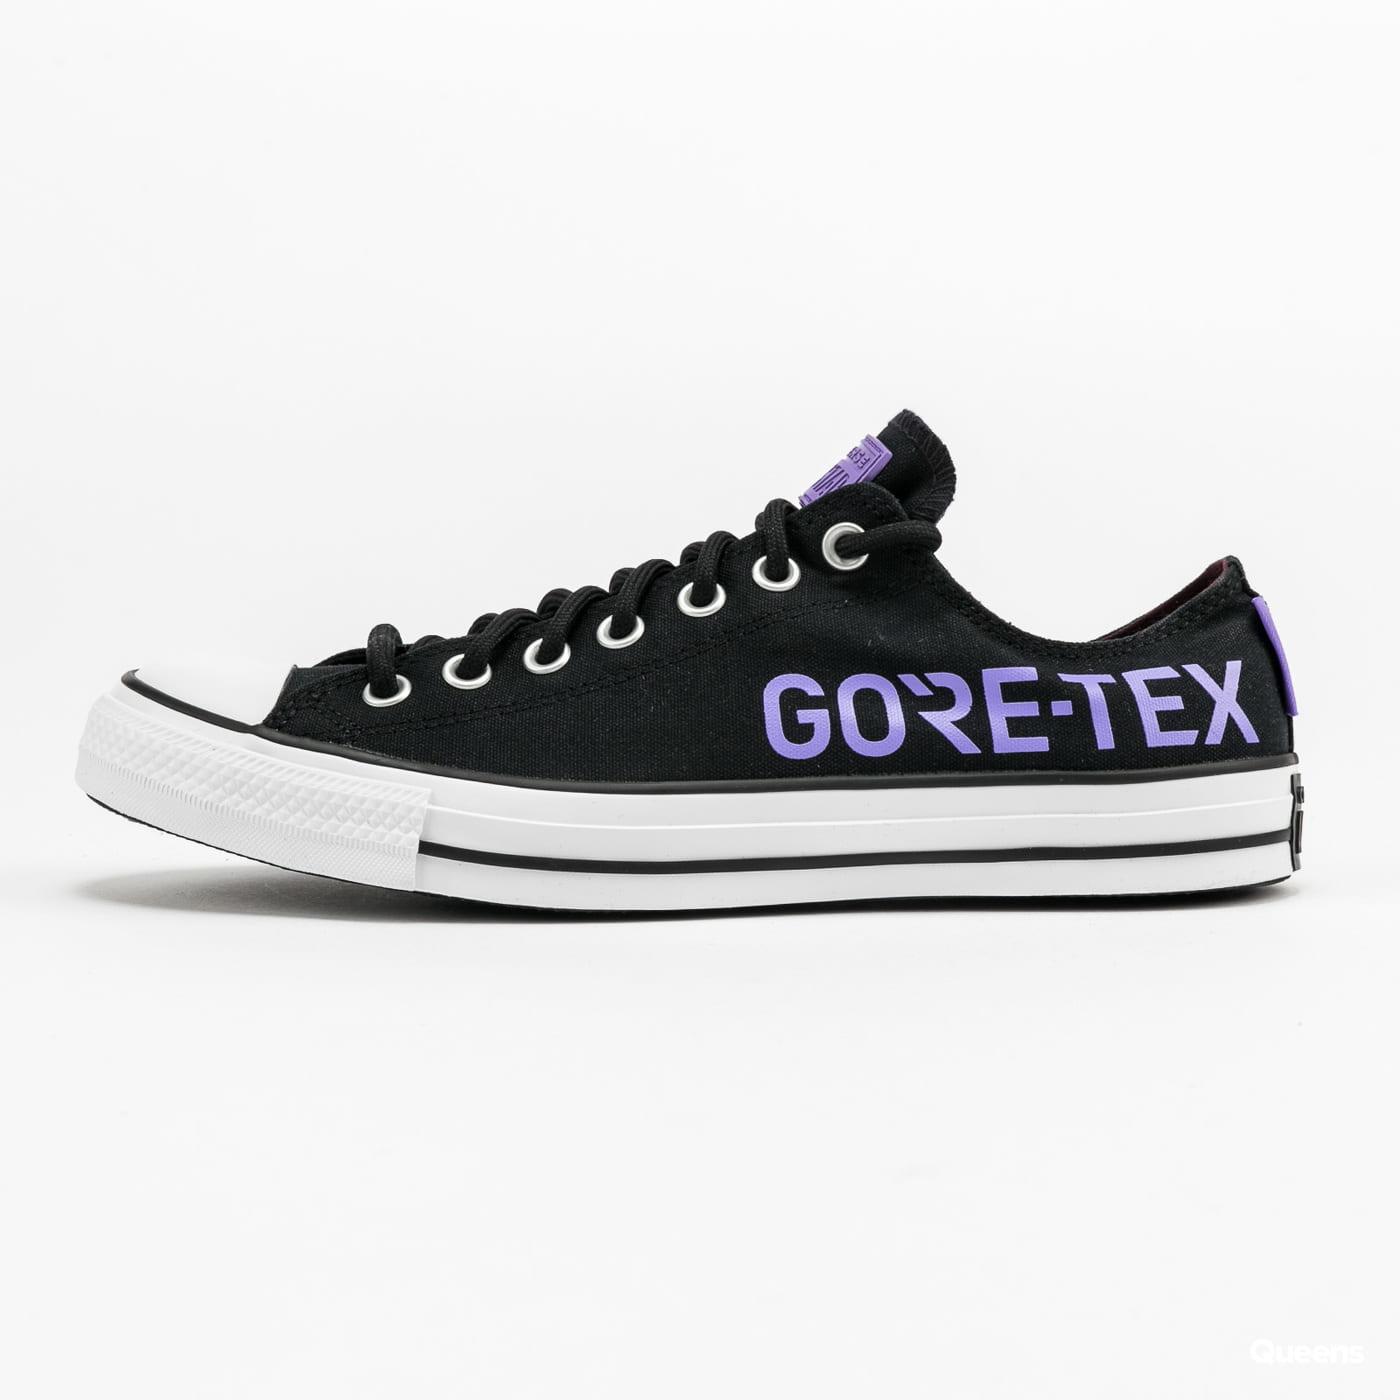 Converse Chuck Taylor All Star GTX OX black / bright lilac / white